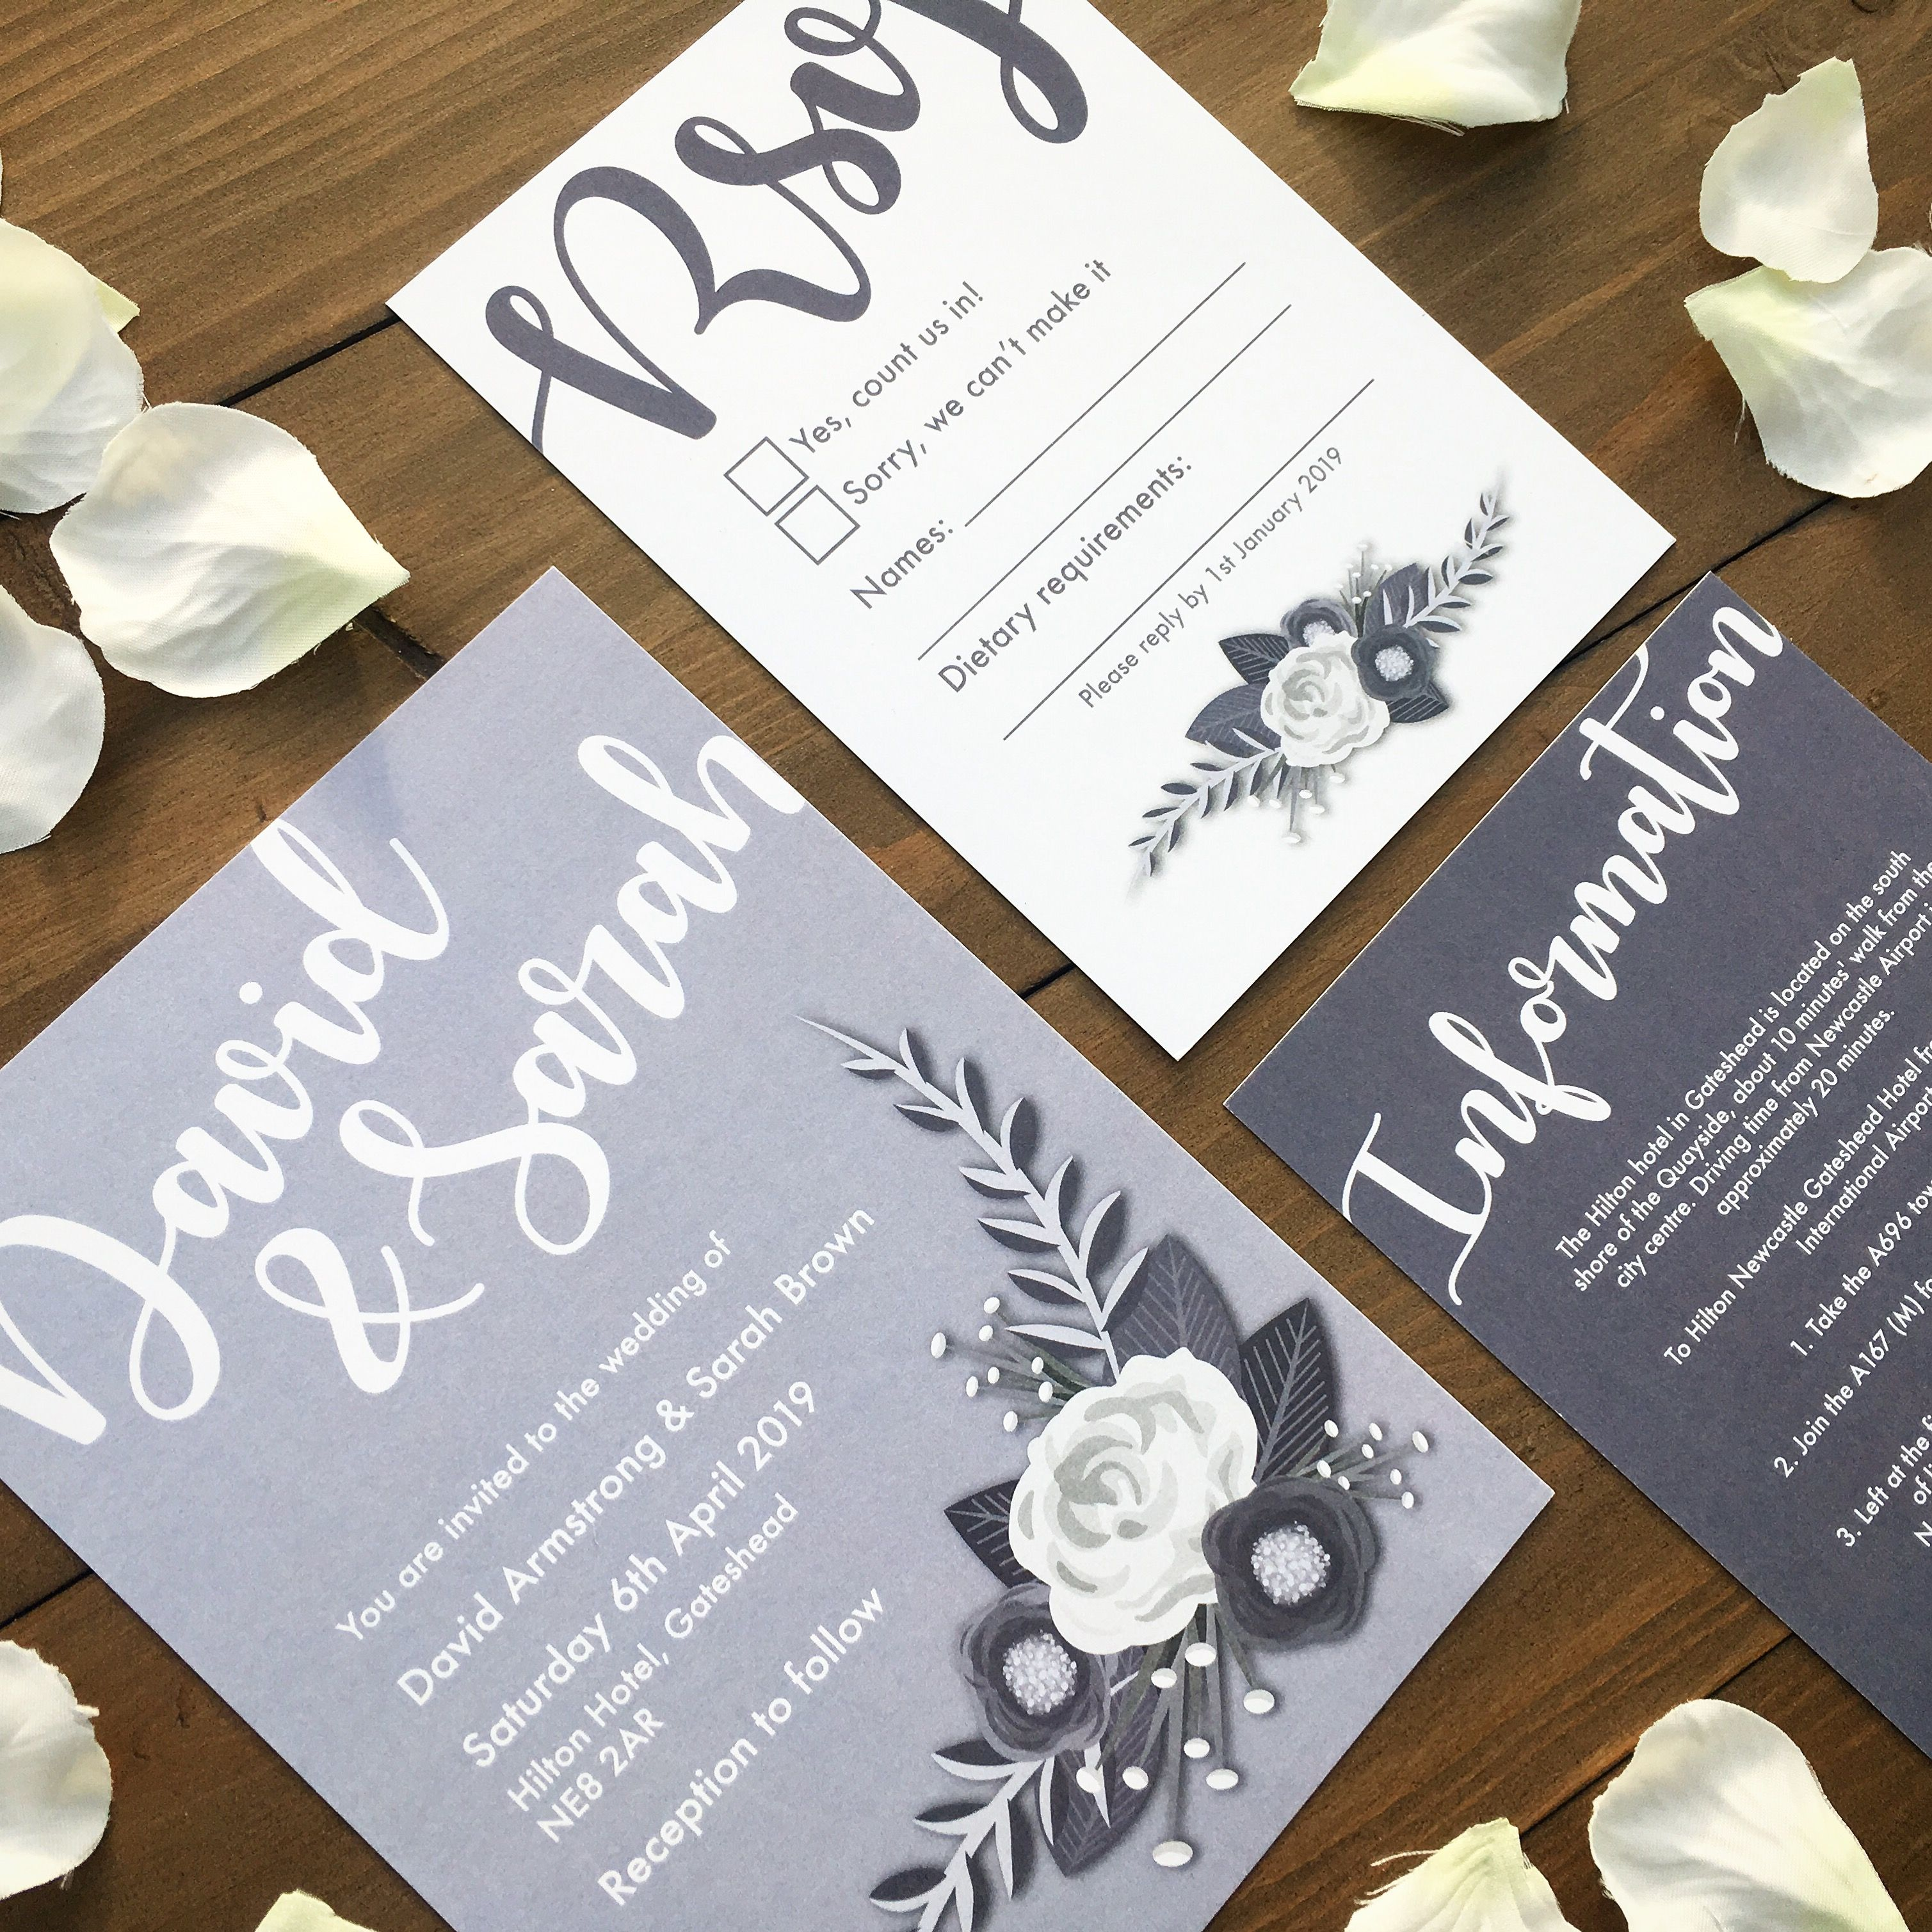 Monochrome Wedding Invitation RSVP and Info card